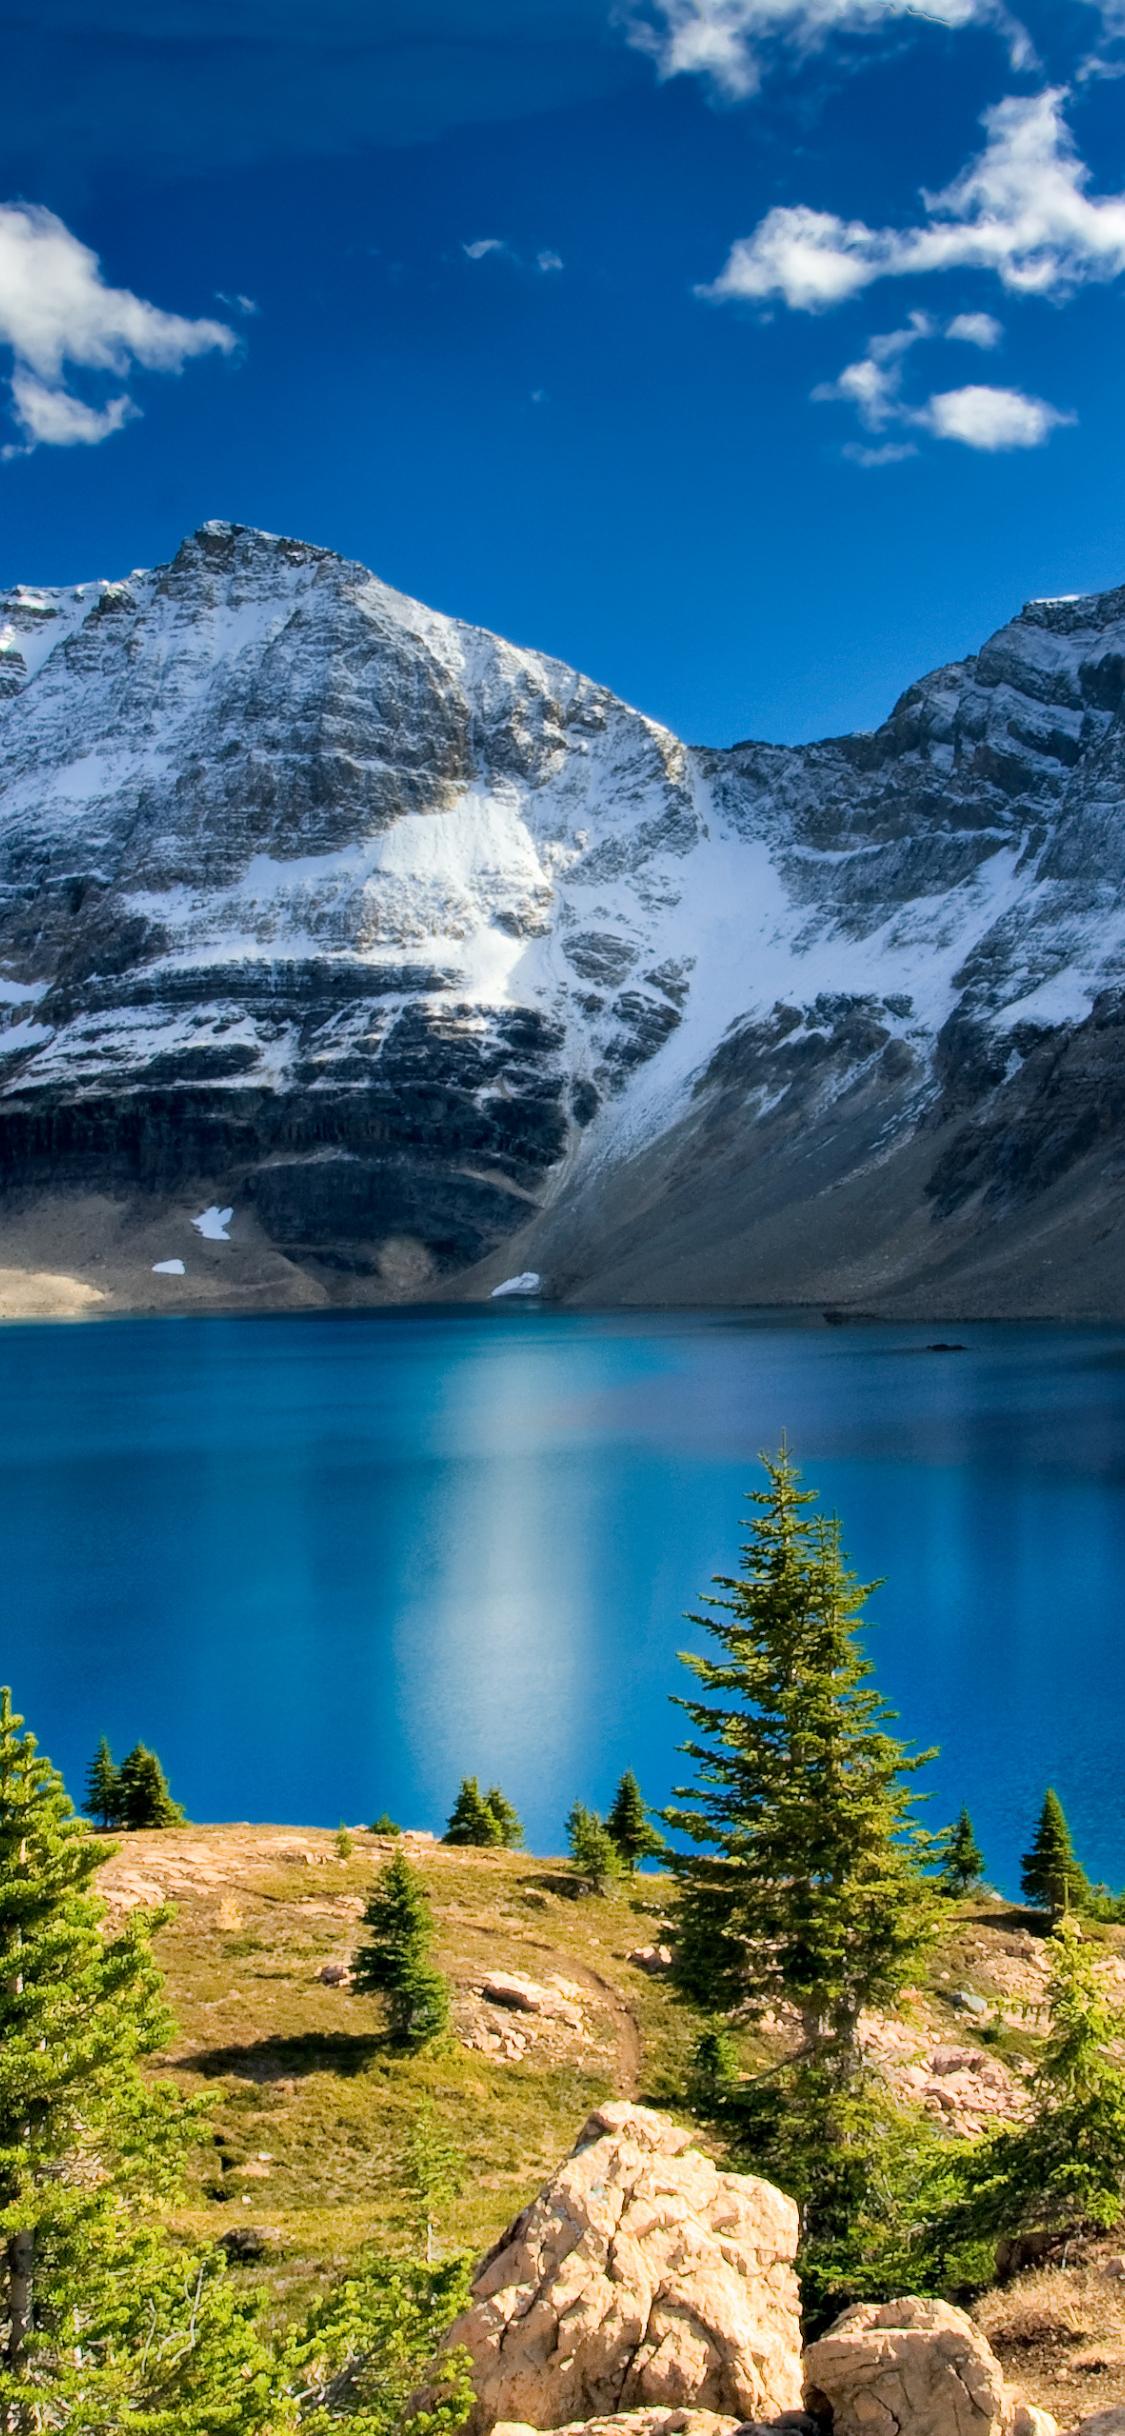 4k nature mountain fog forest desktop wallpapers wallpaperhtml ultrahd landscape lake phone